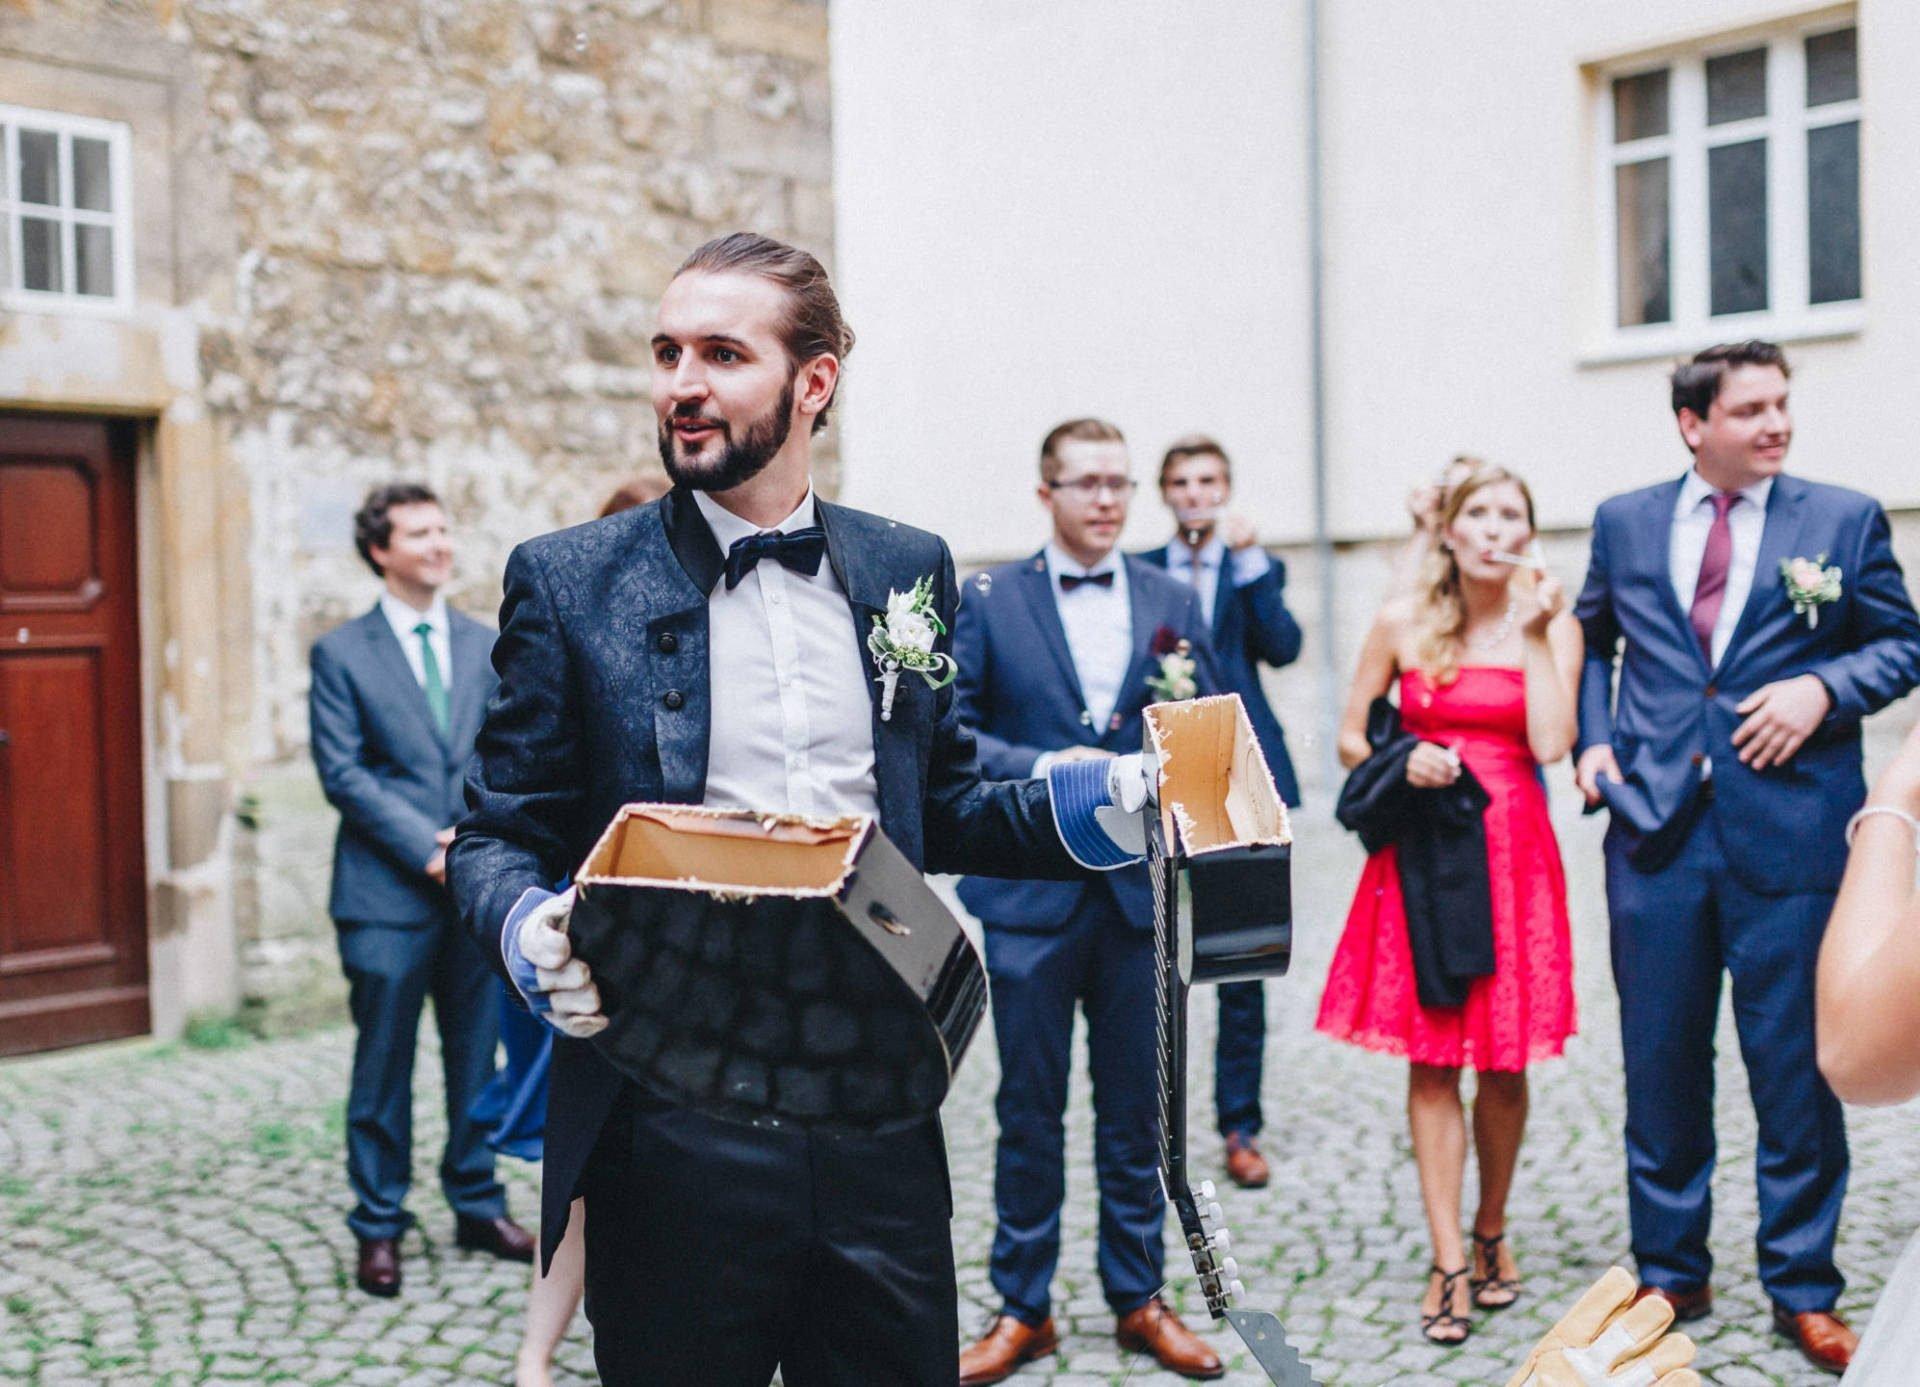 JuleSascha 20 1920x1387 - Hochzeit im alten Dornburger Schloss